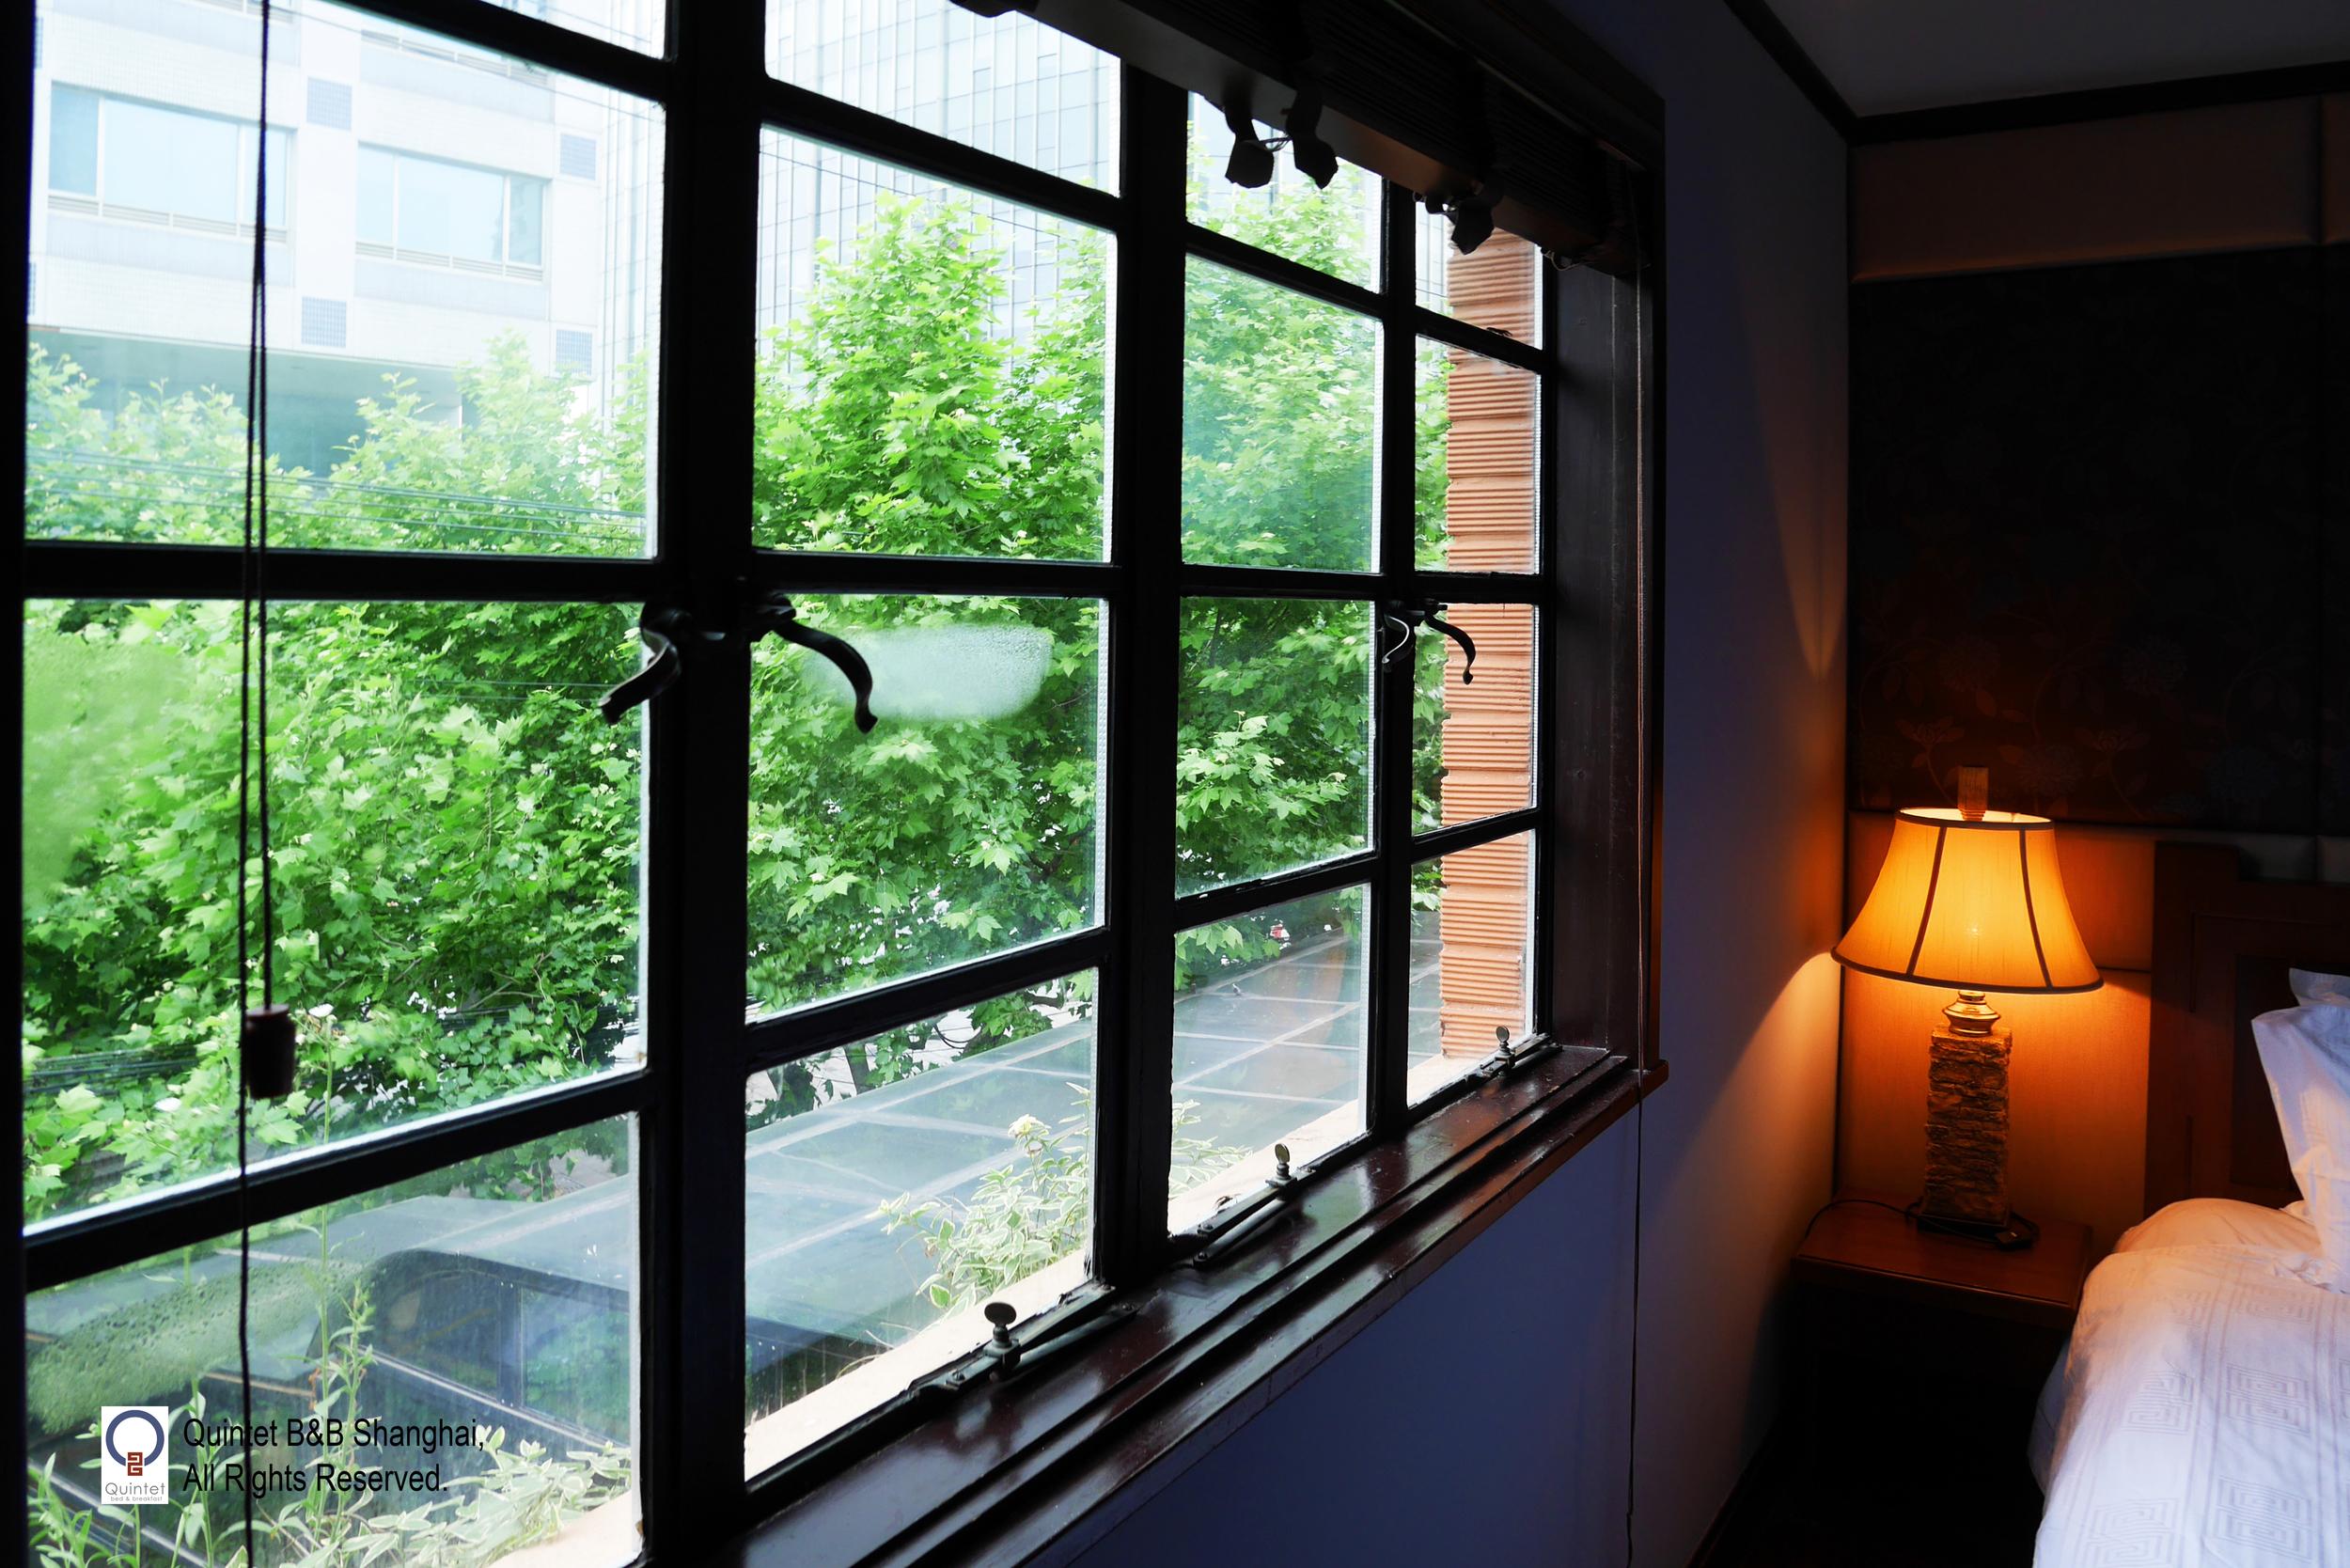 Shanghai Quintet hotel_Bubbling Well (4).JPG